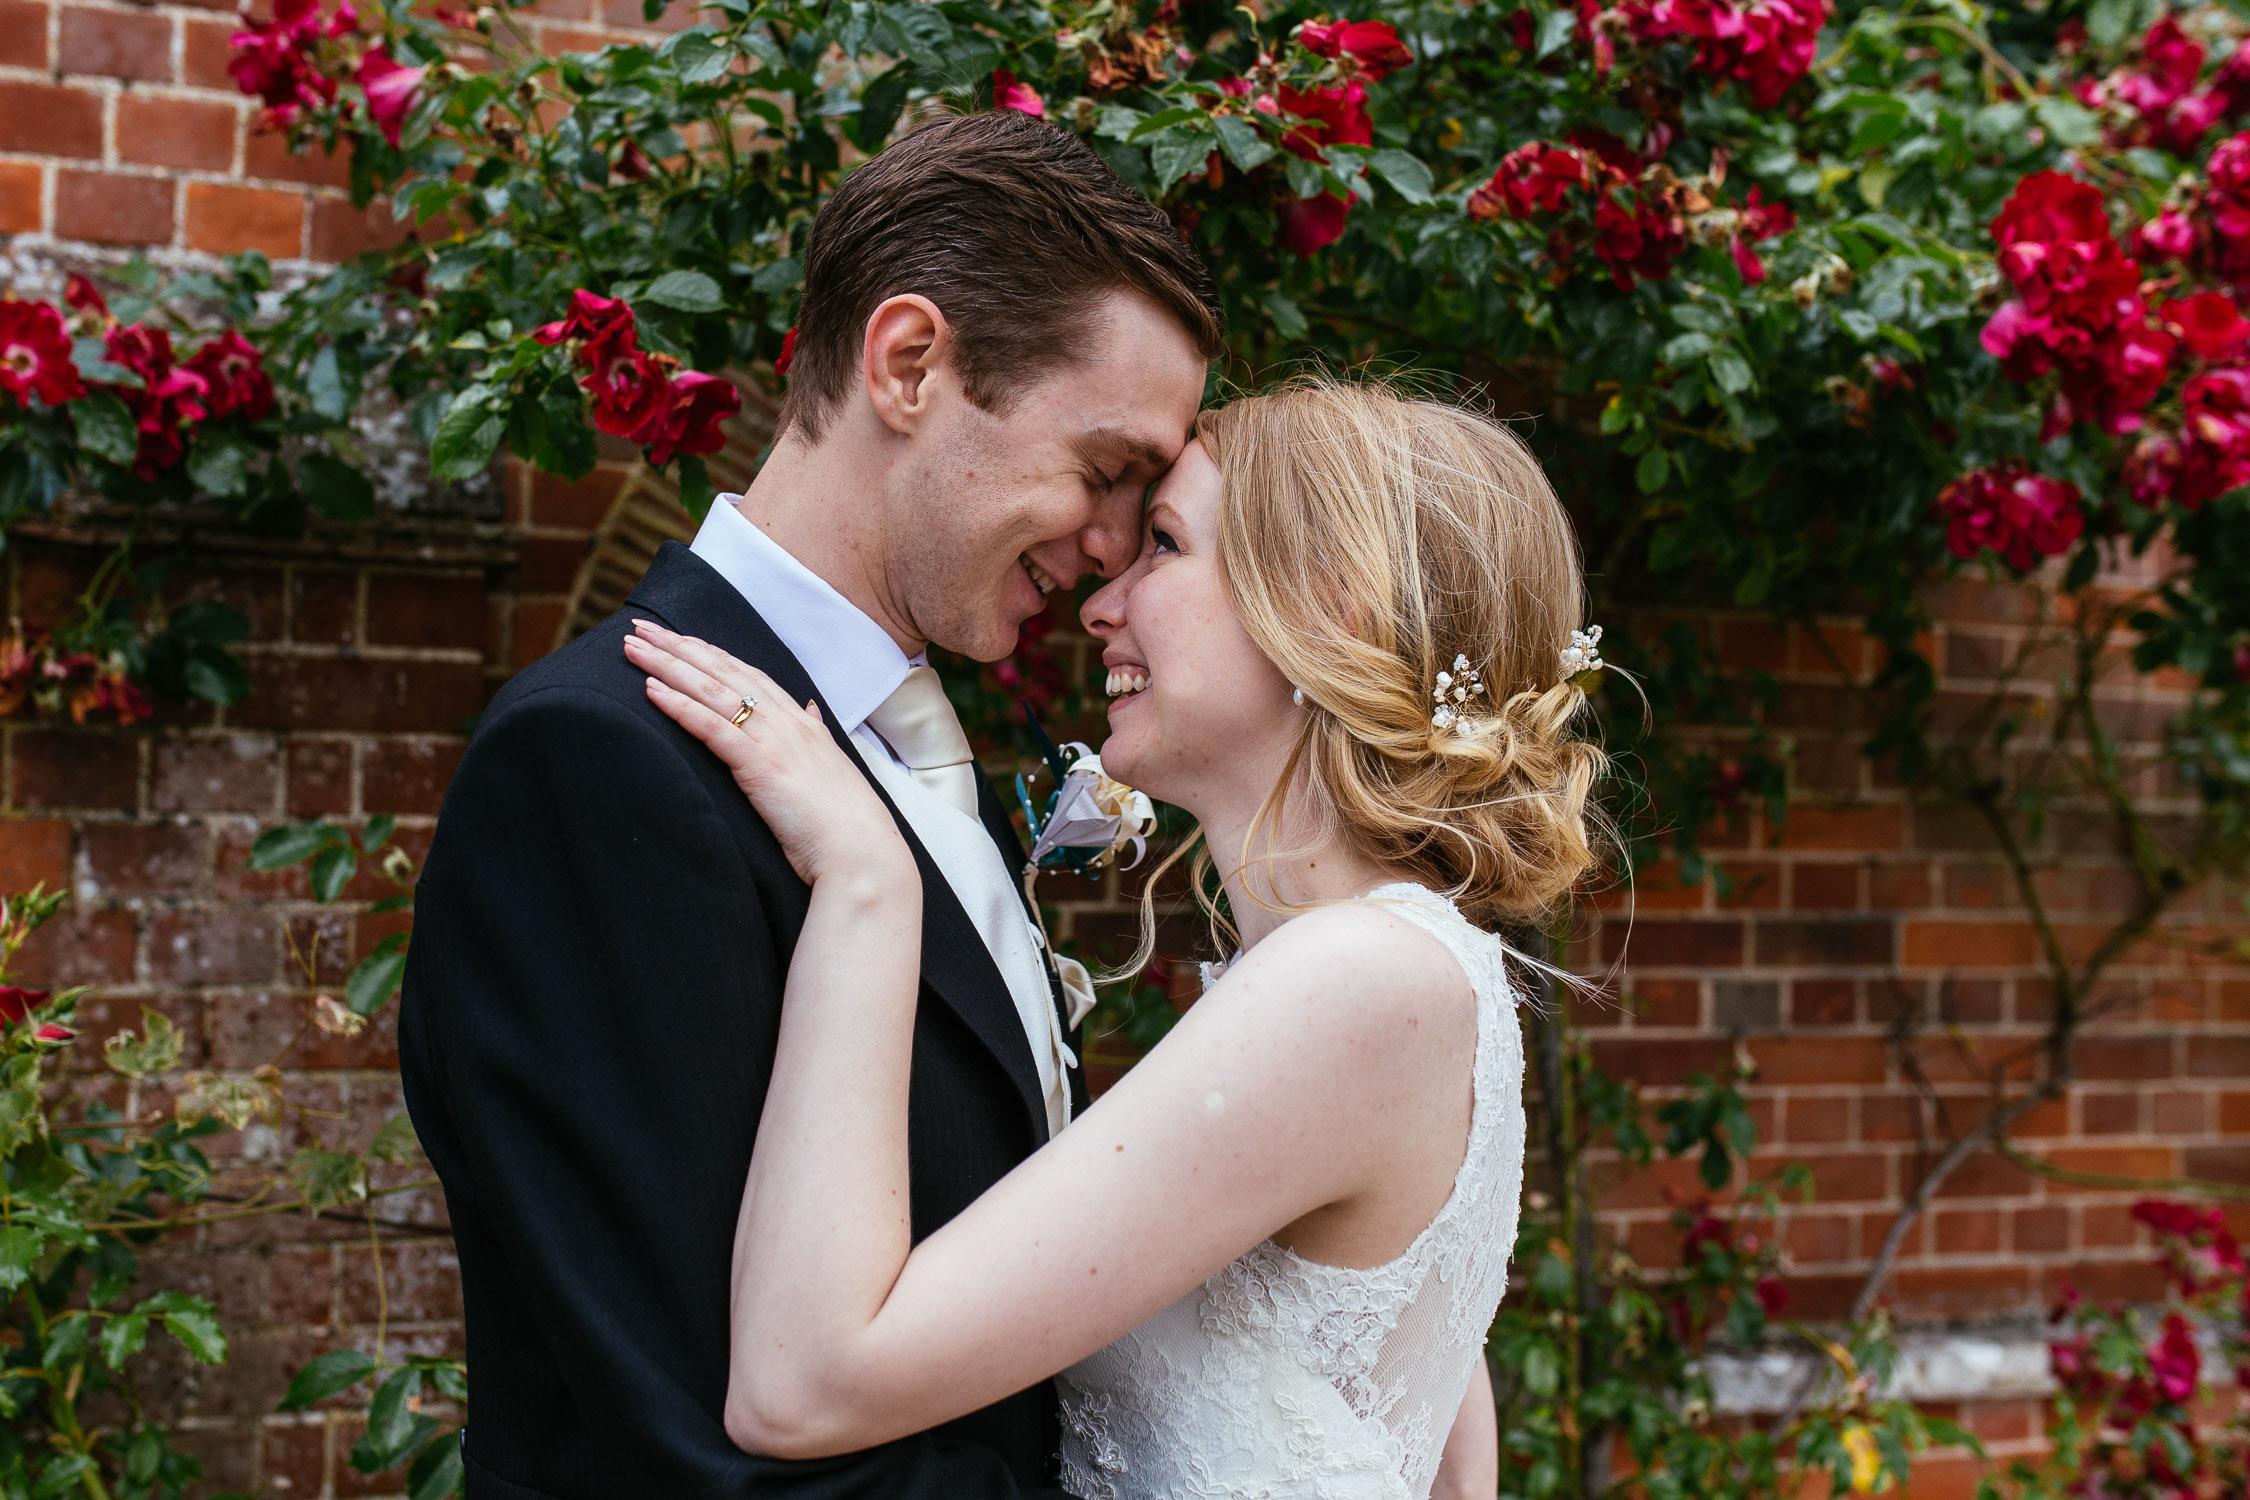 Lizi-and-Mark-Wedding-Highlights-66.jpg